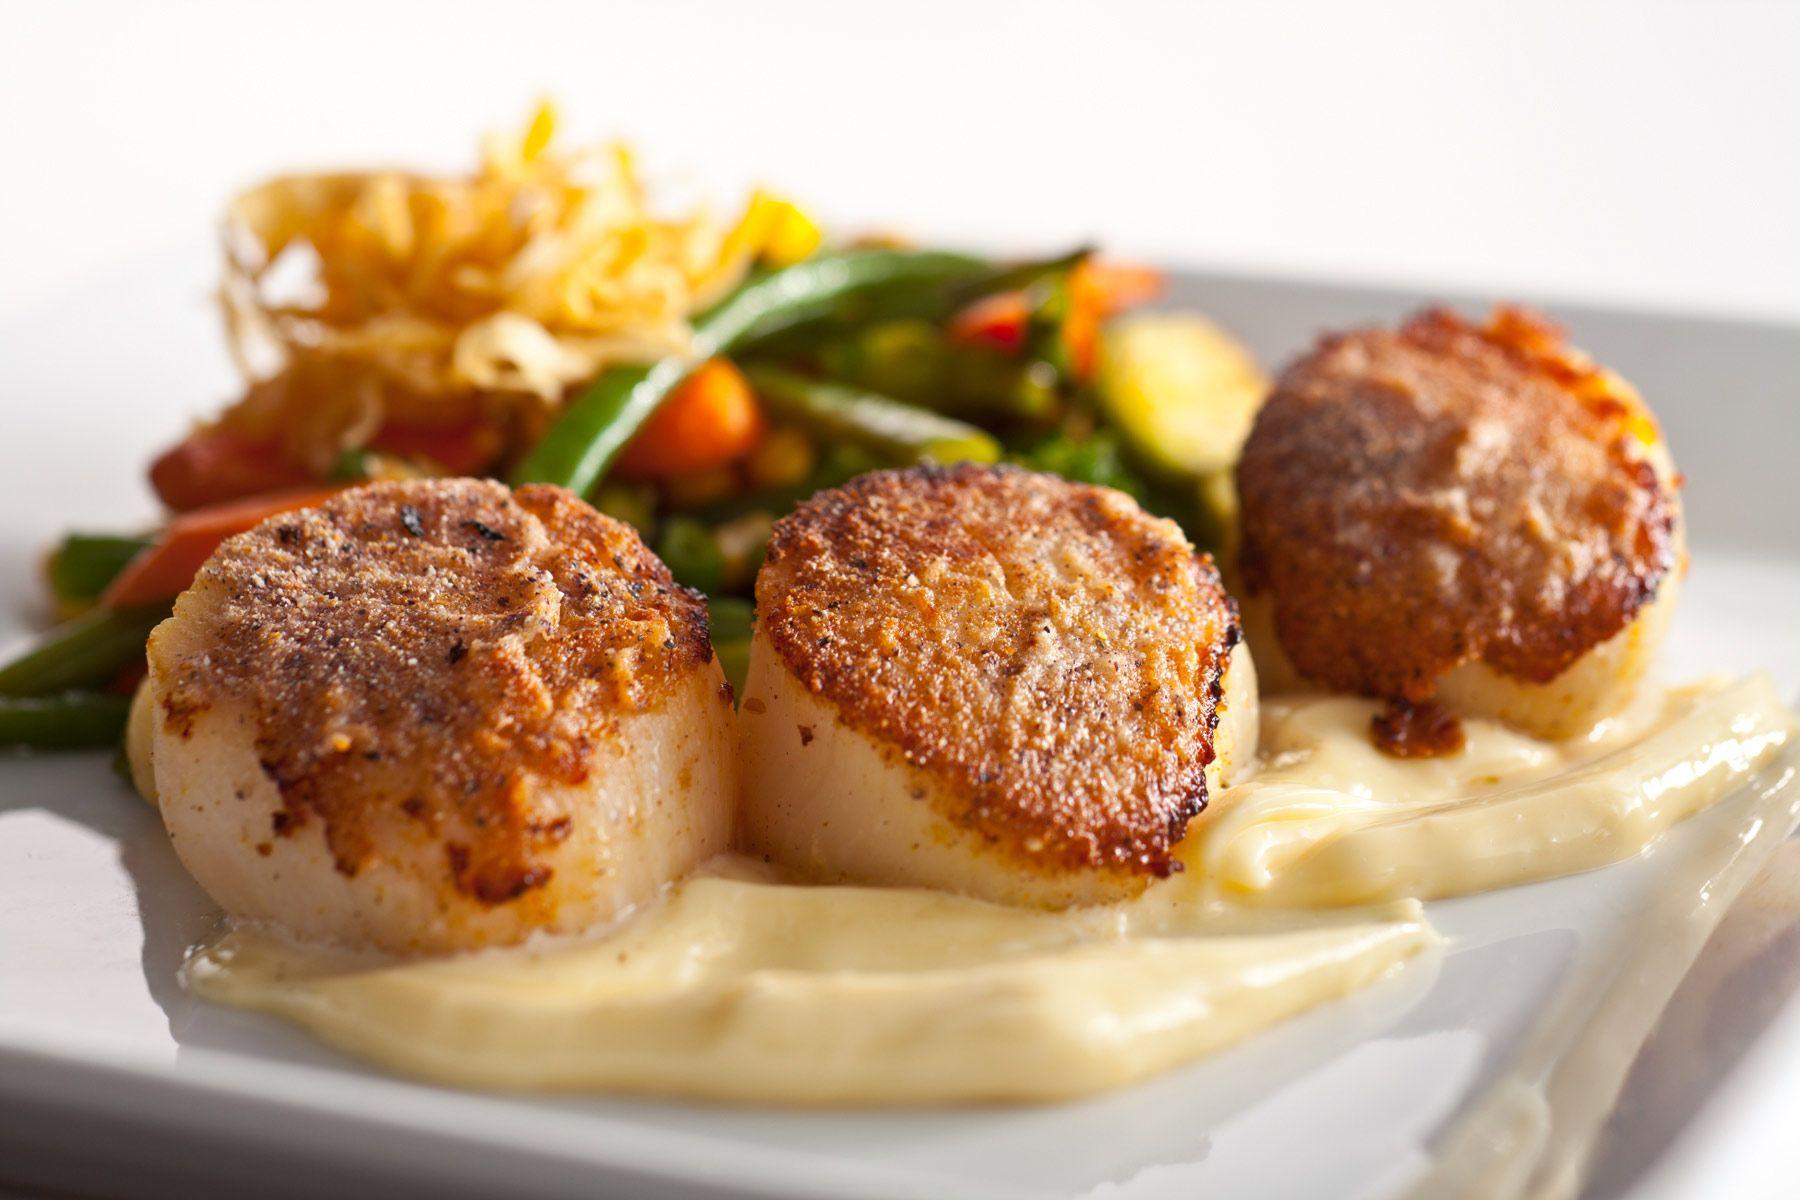 Scallops-by-Chef-Michael-Garbin-Union-League-of-Chicago.jpg